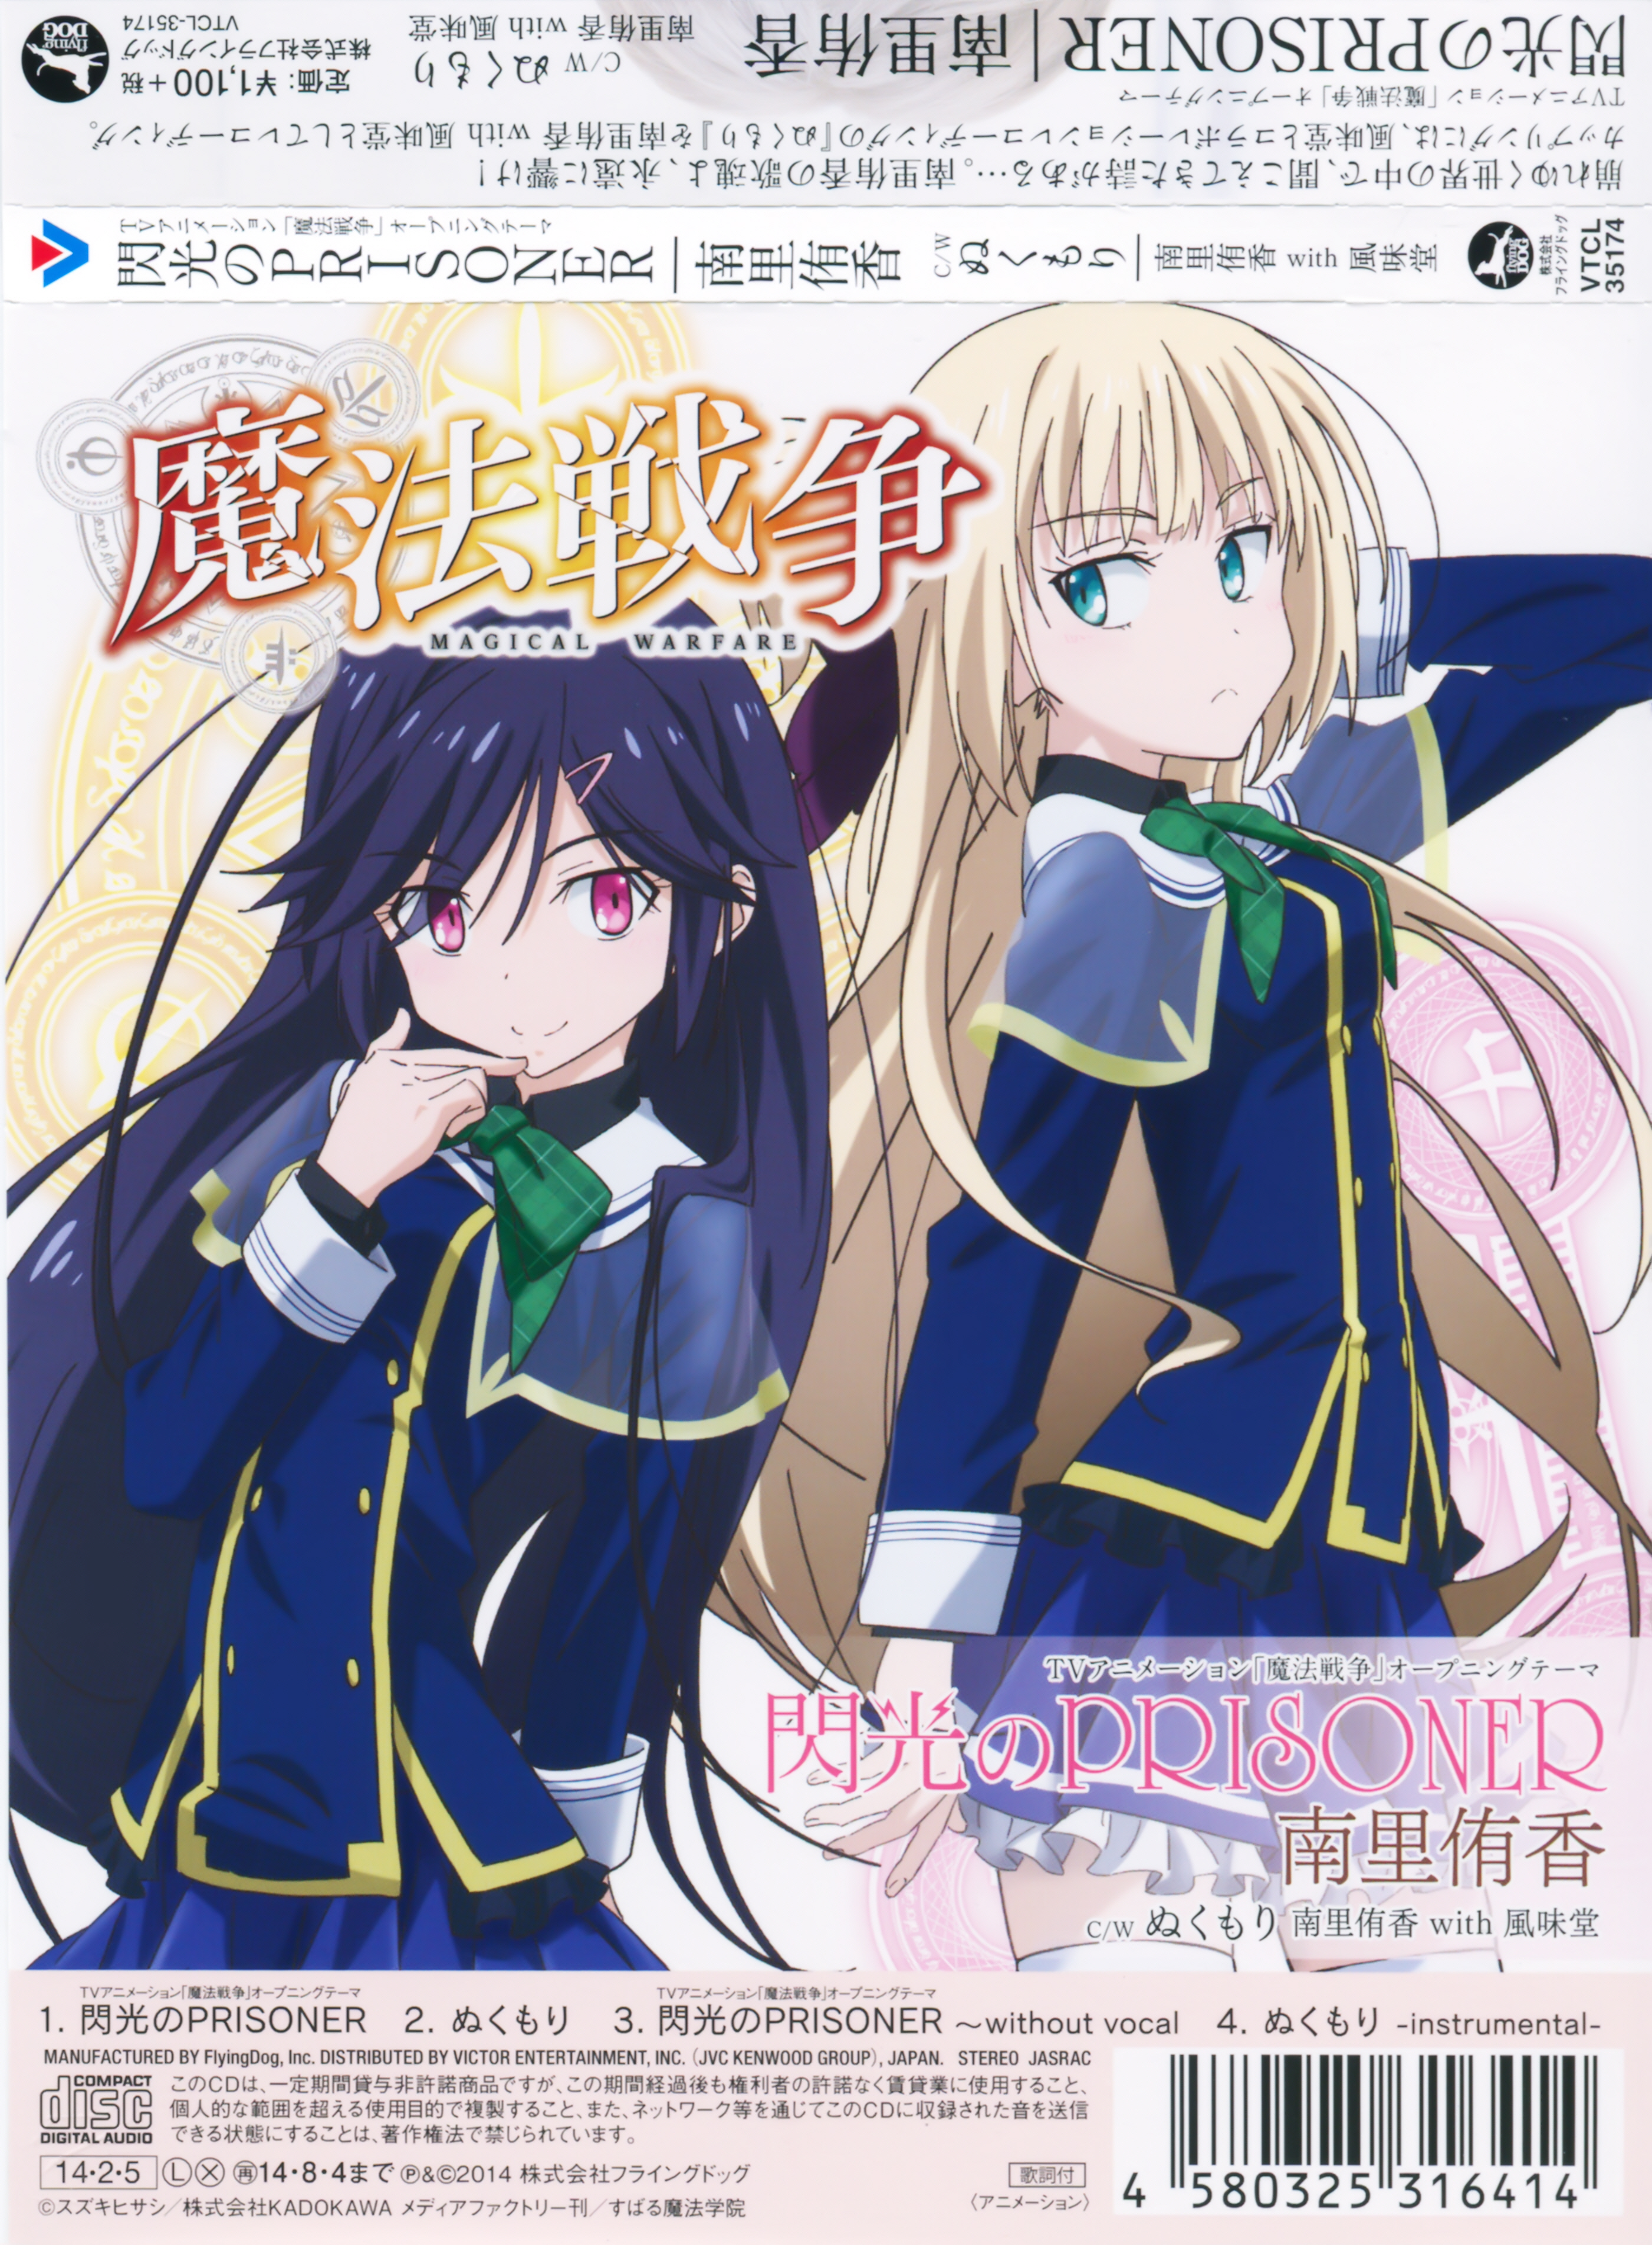 Isoshima Kurumi Mahou Sensou Zerochan Anime Image Board